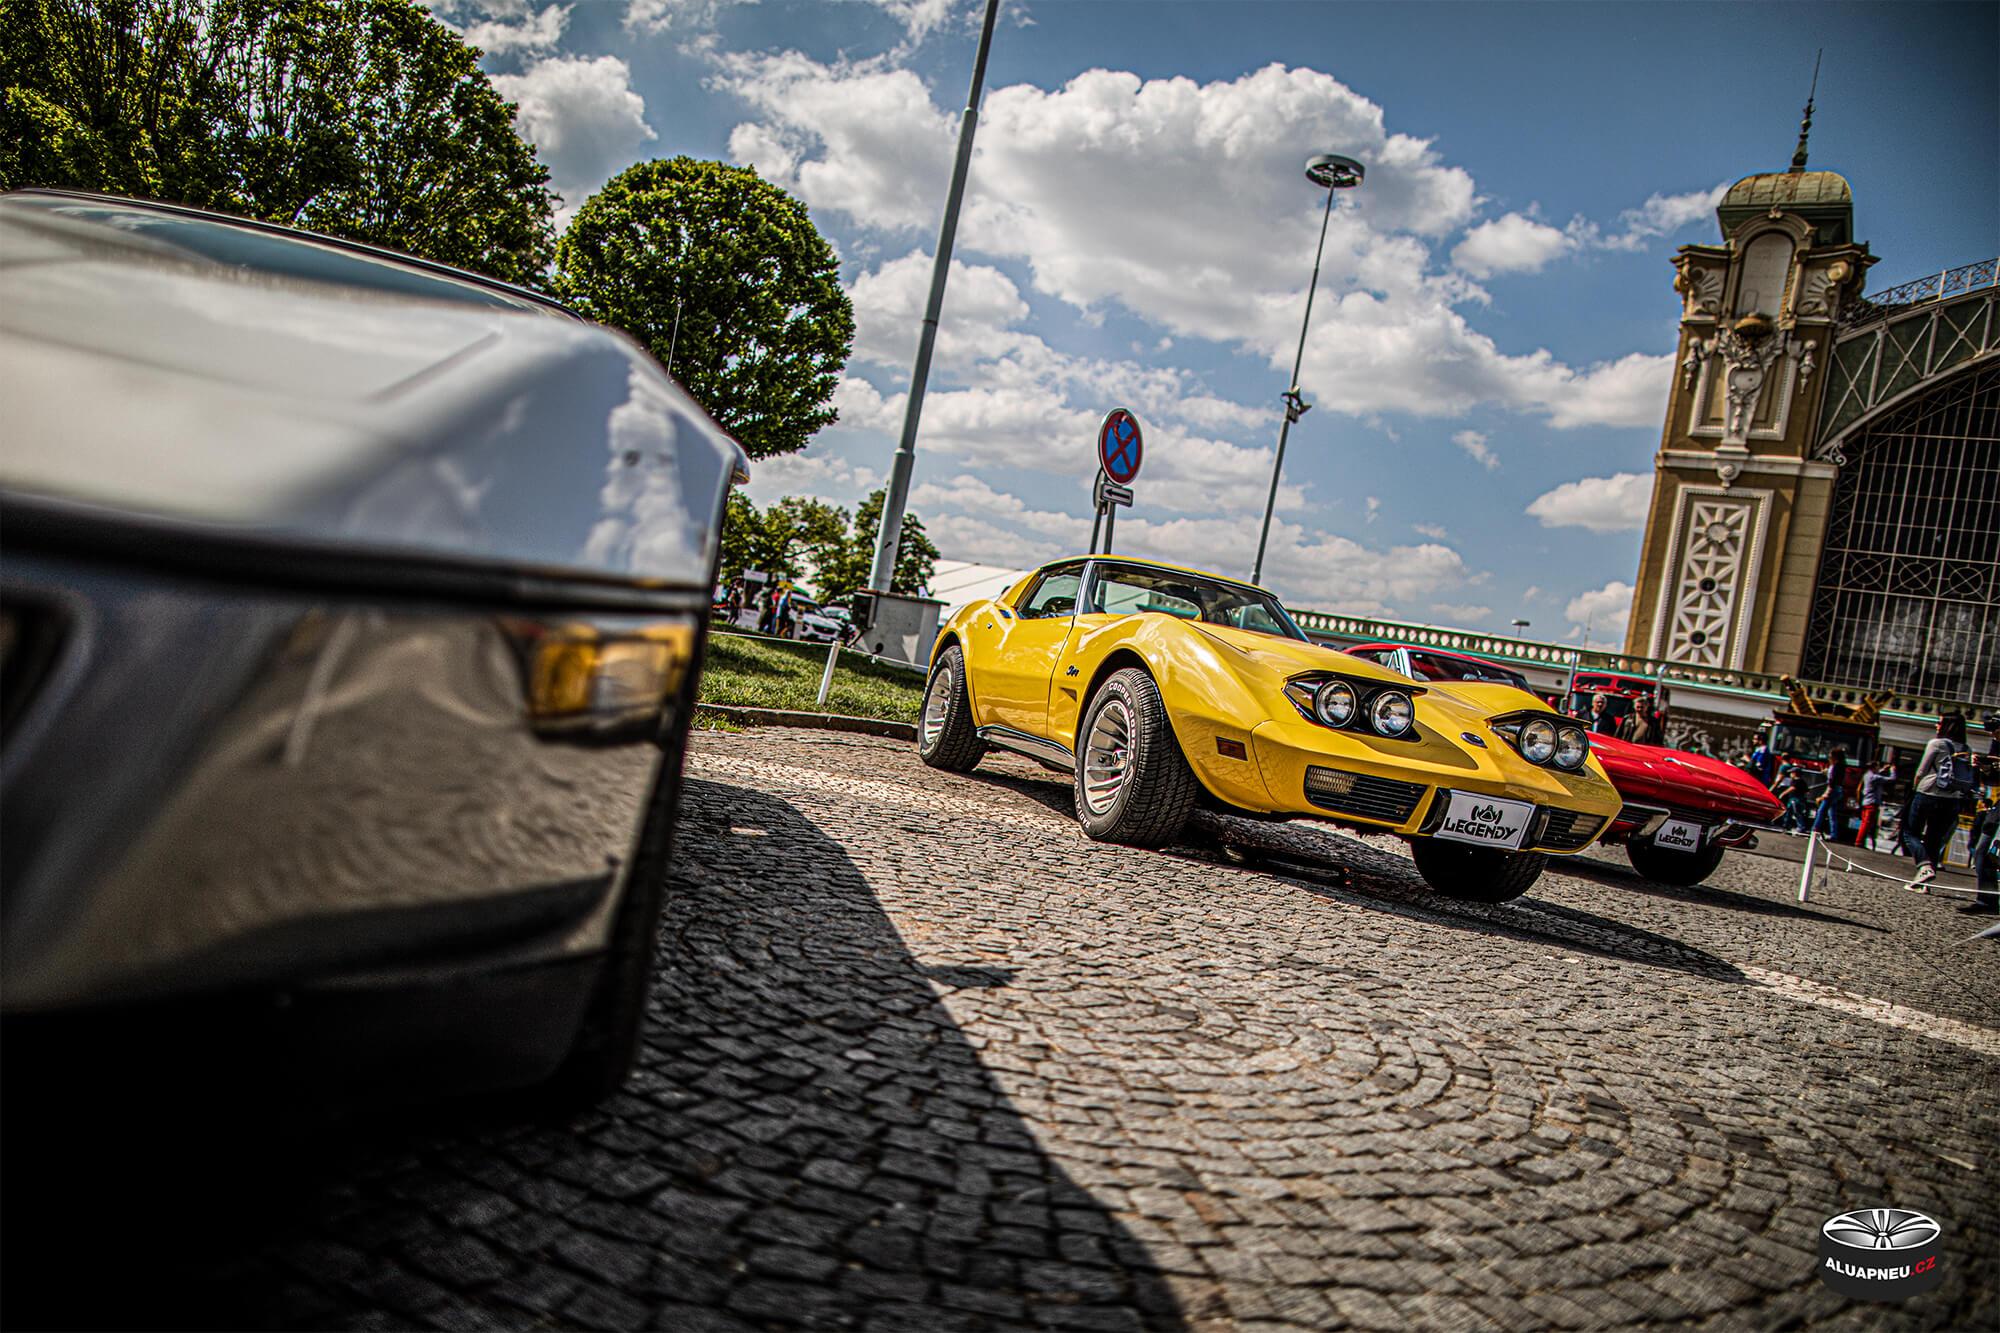 Corvette - Youngtimer - Legendy - www.aluapneu.cz